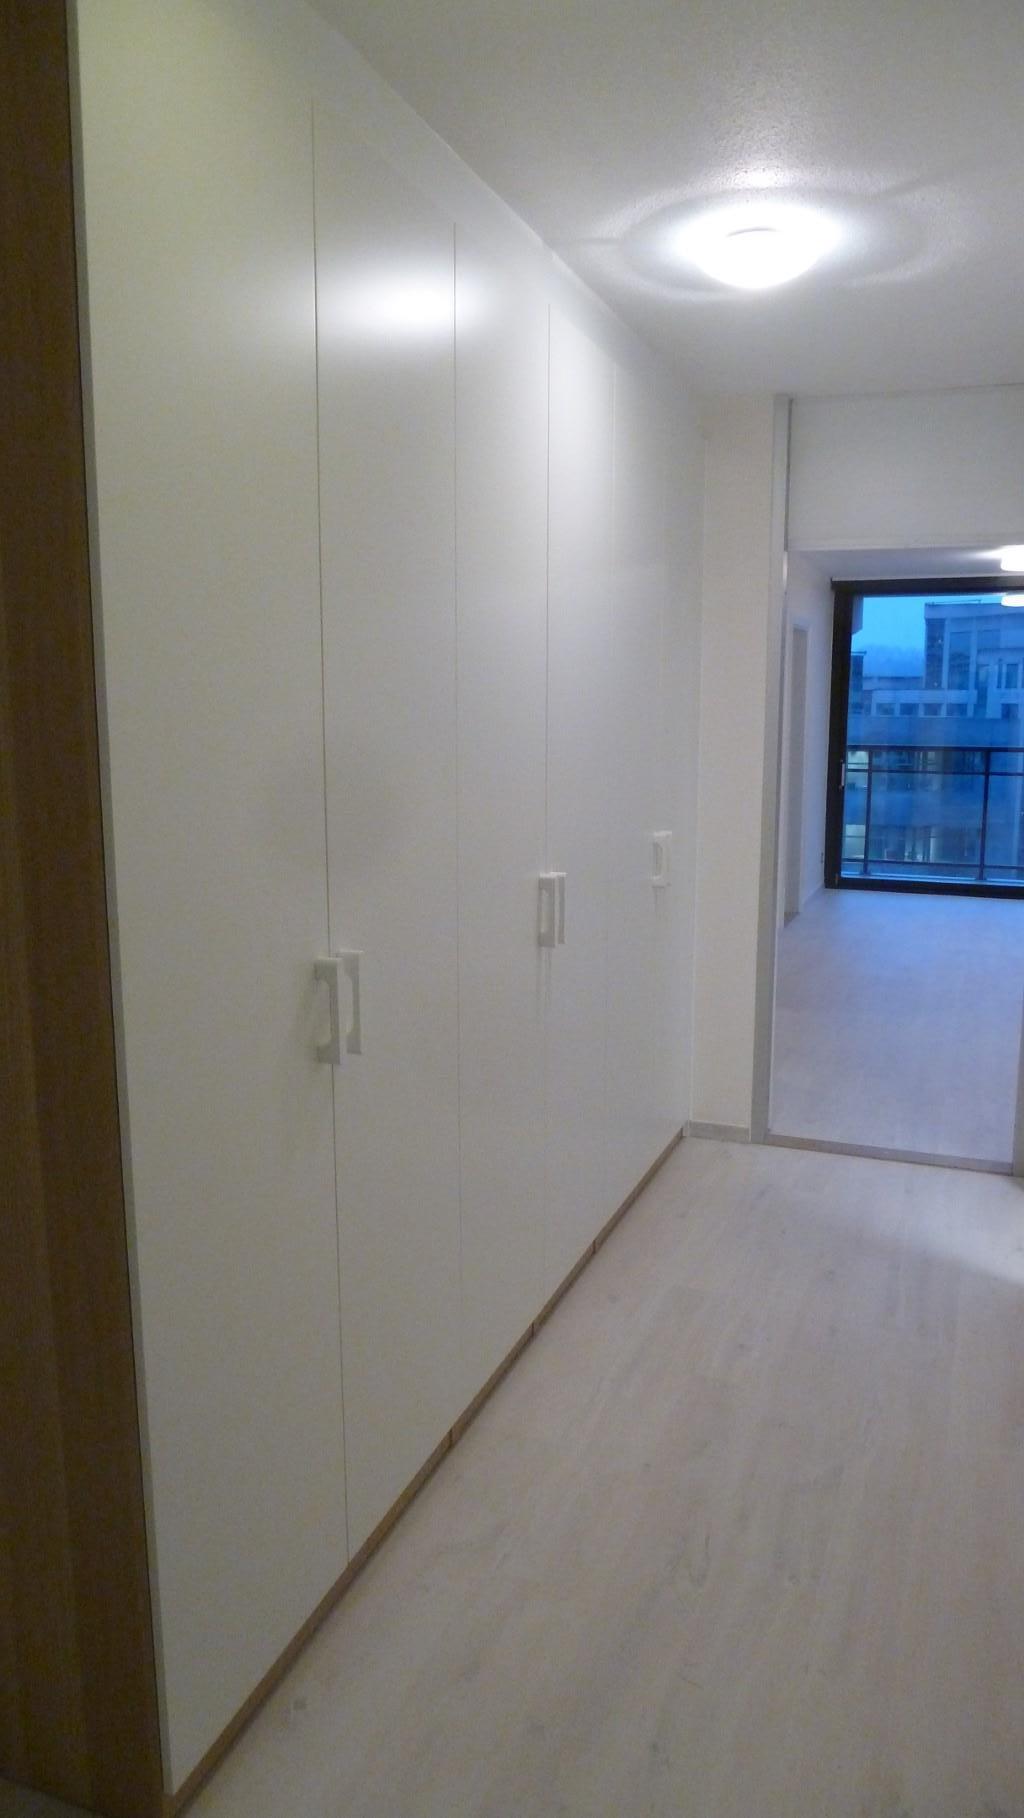 Appartement - Zaventem Sint-Stevens-Woluwe - #3970084-5